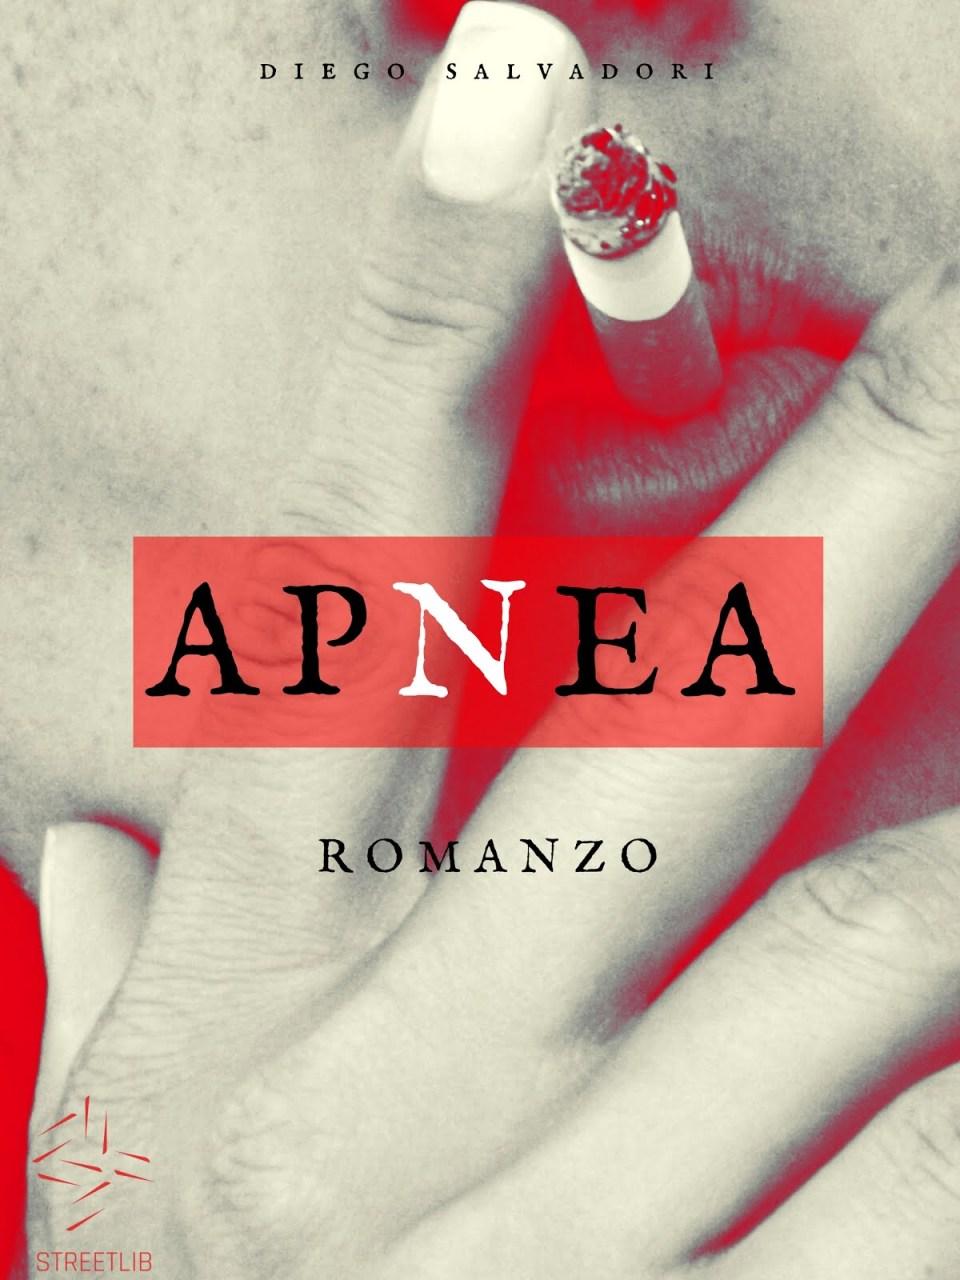 Apnea Book Cover